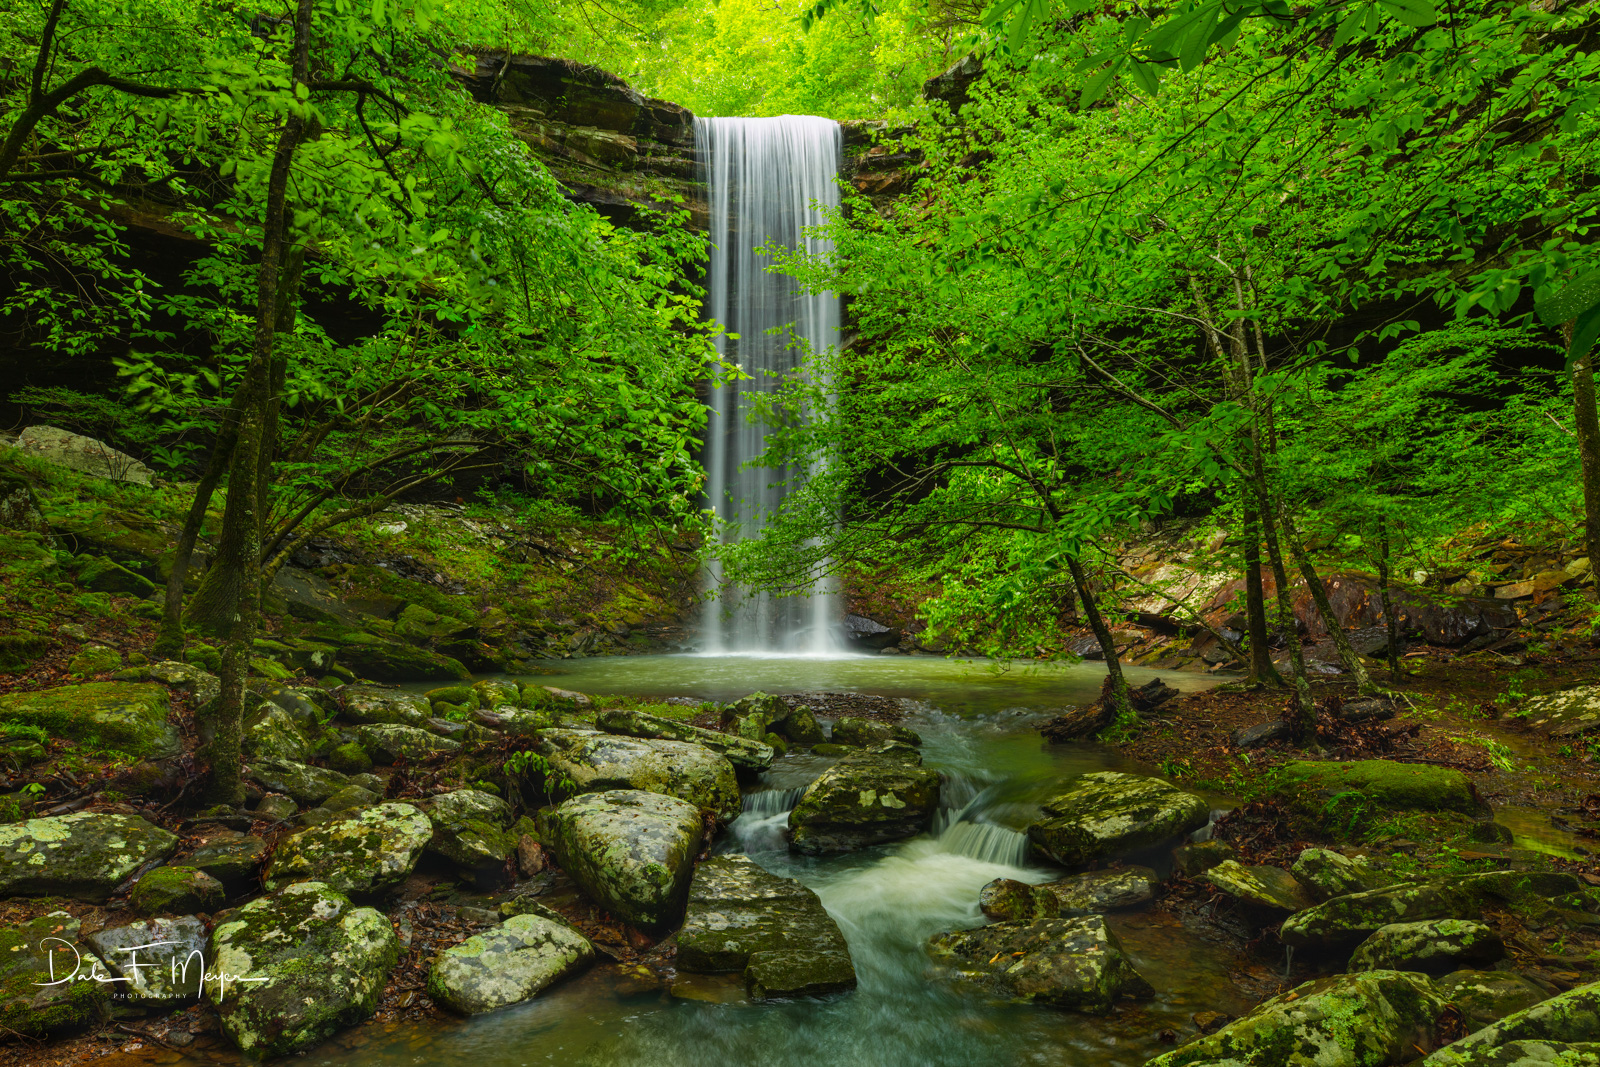 Bowers Hollow Falls Arkansas, River Streams and Waterfalls Gallery, Buffalo River Region, Arkansas, photo